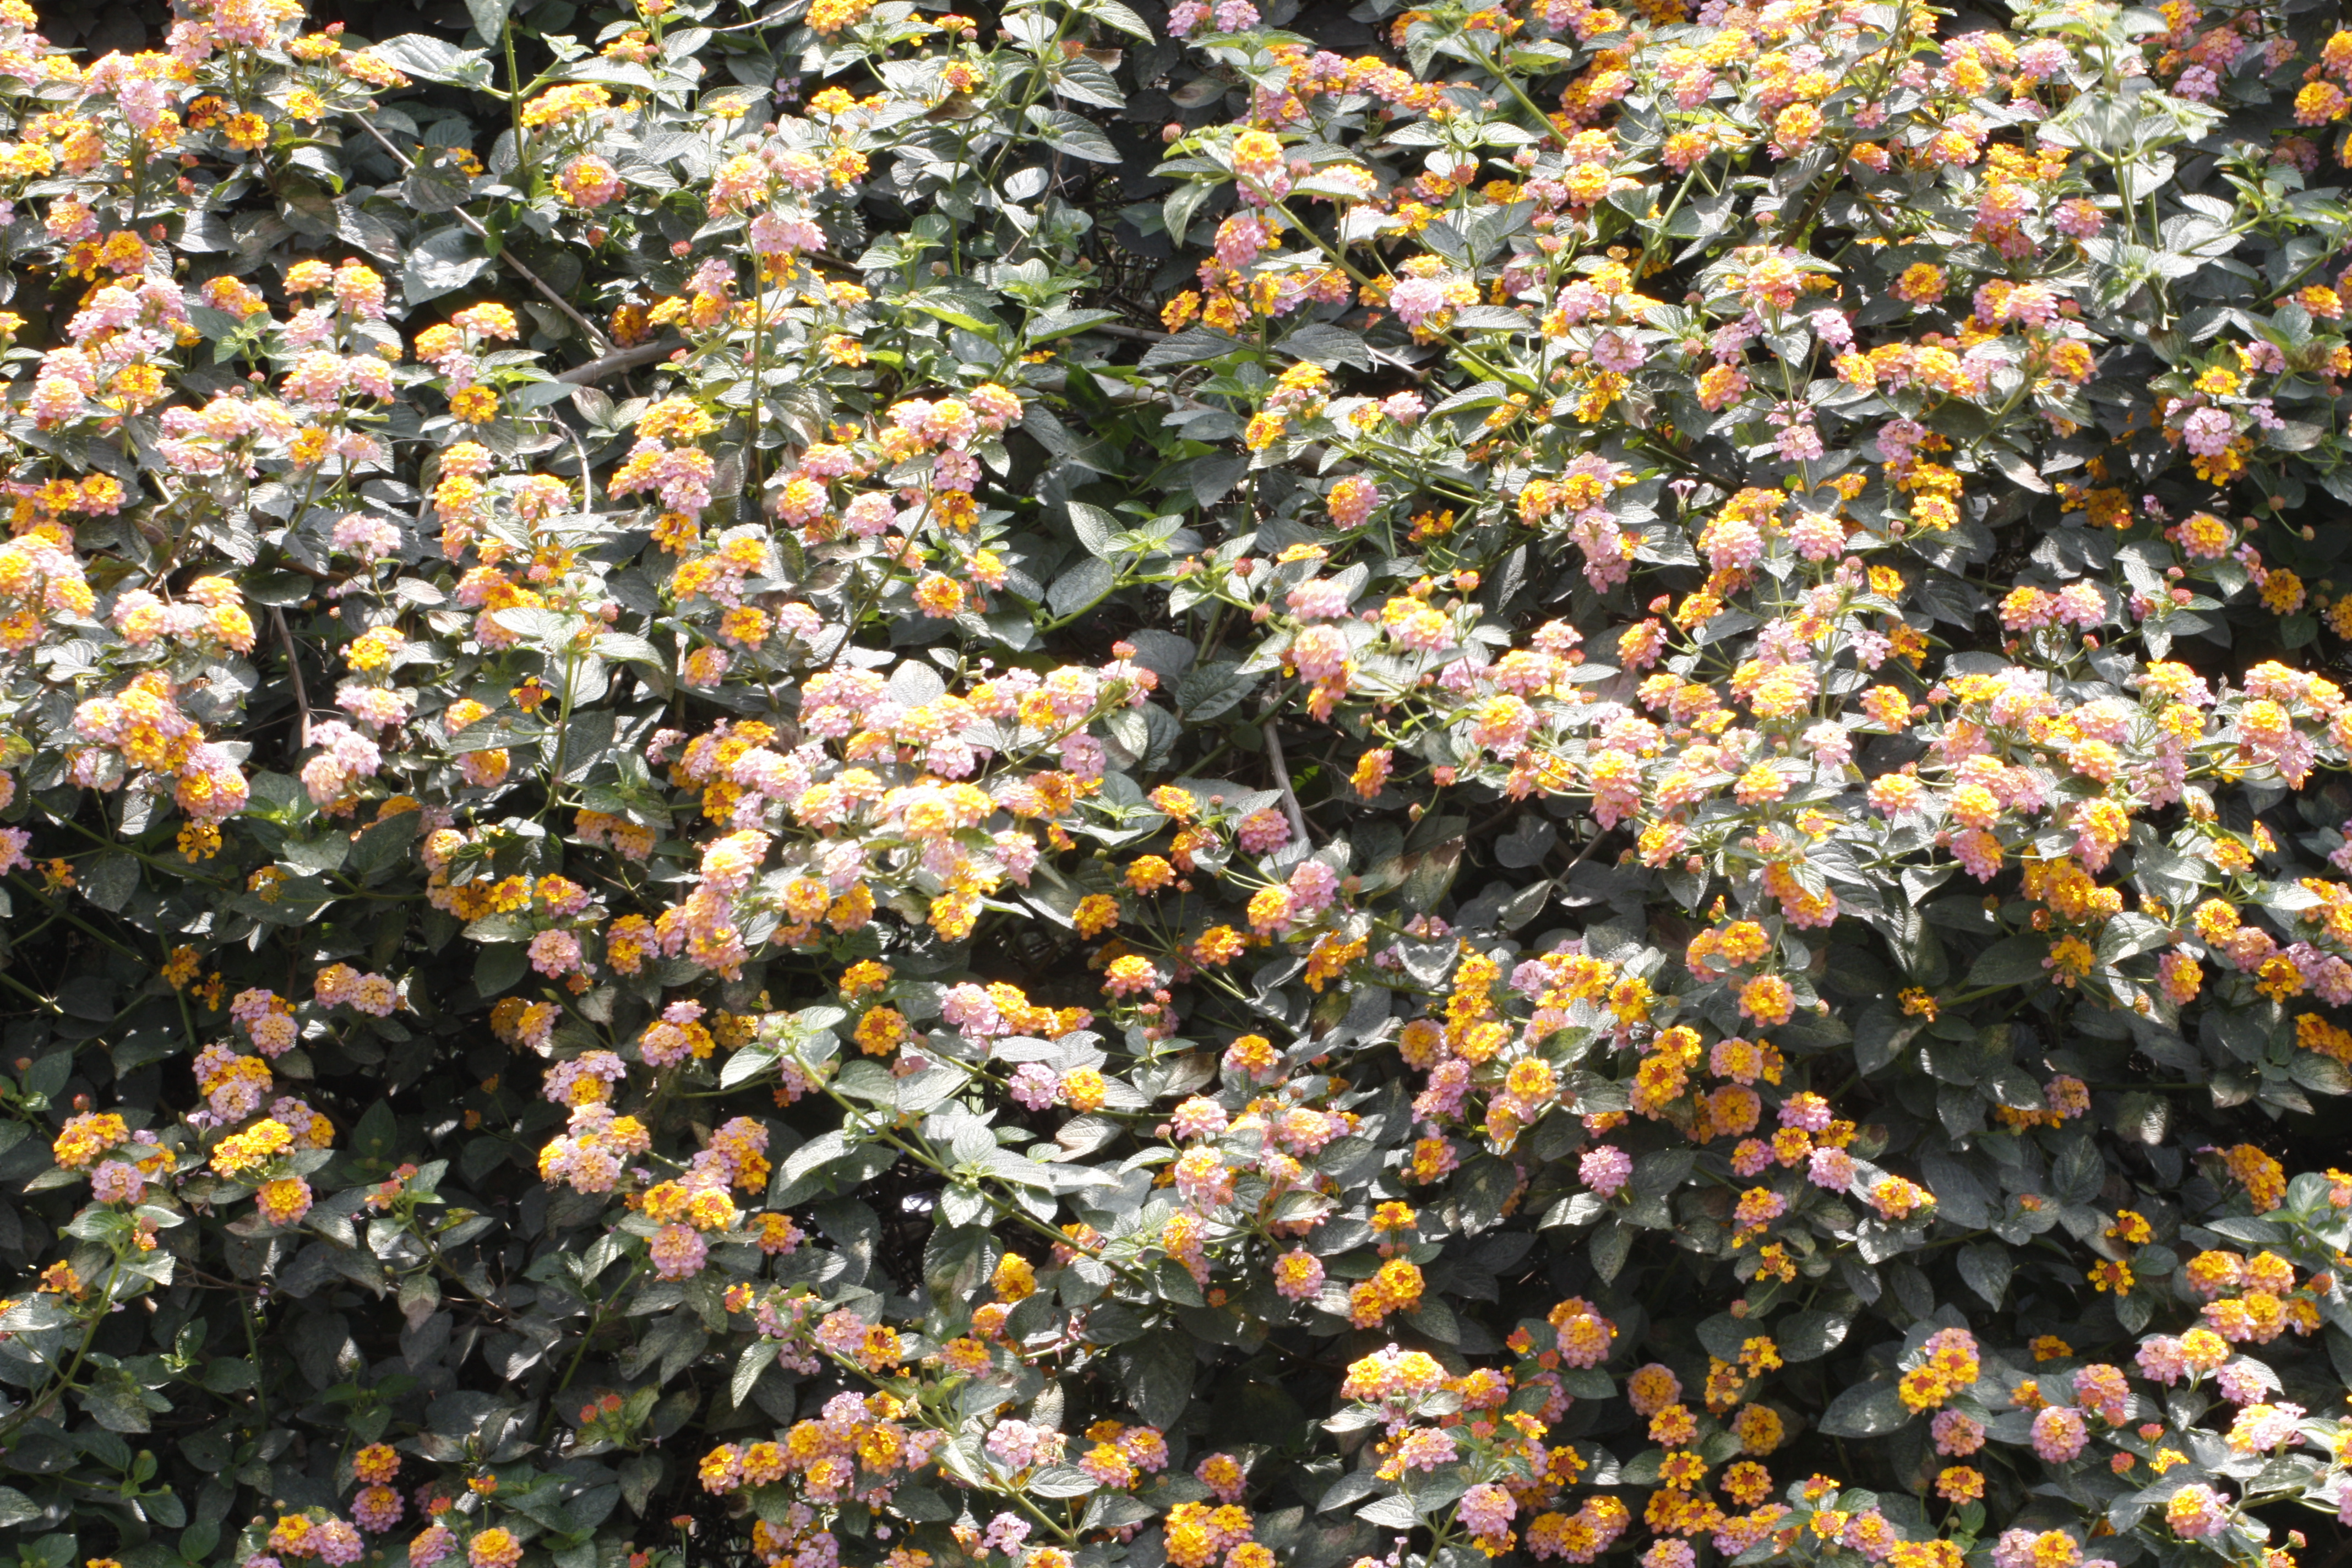 Flower bed, Flowers, Garden, Green, Leaves, HQ Photo